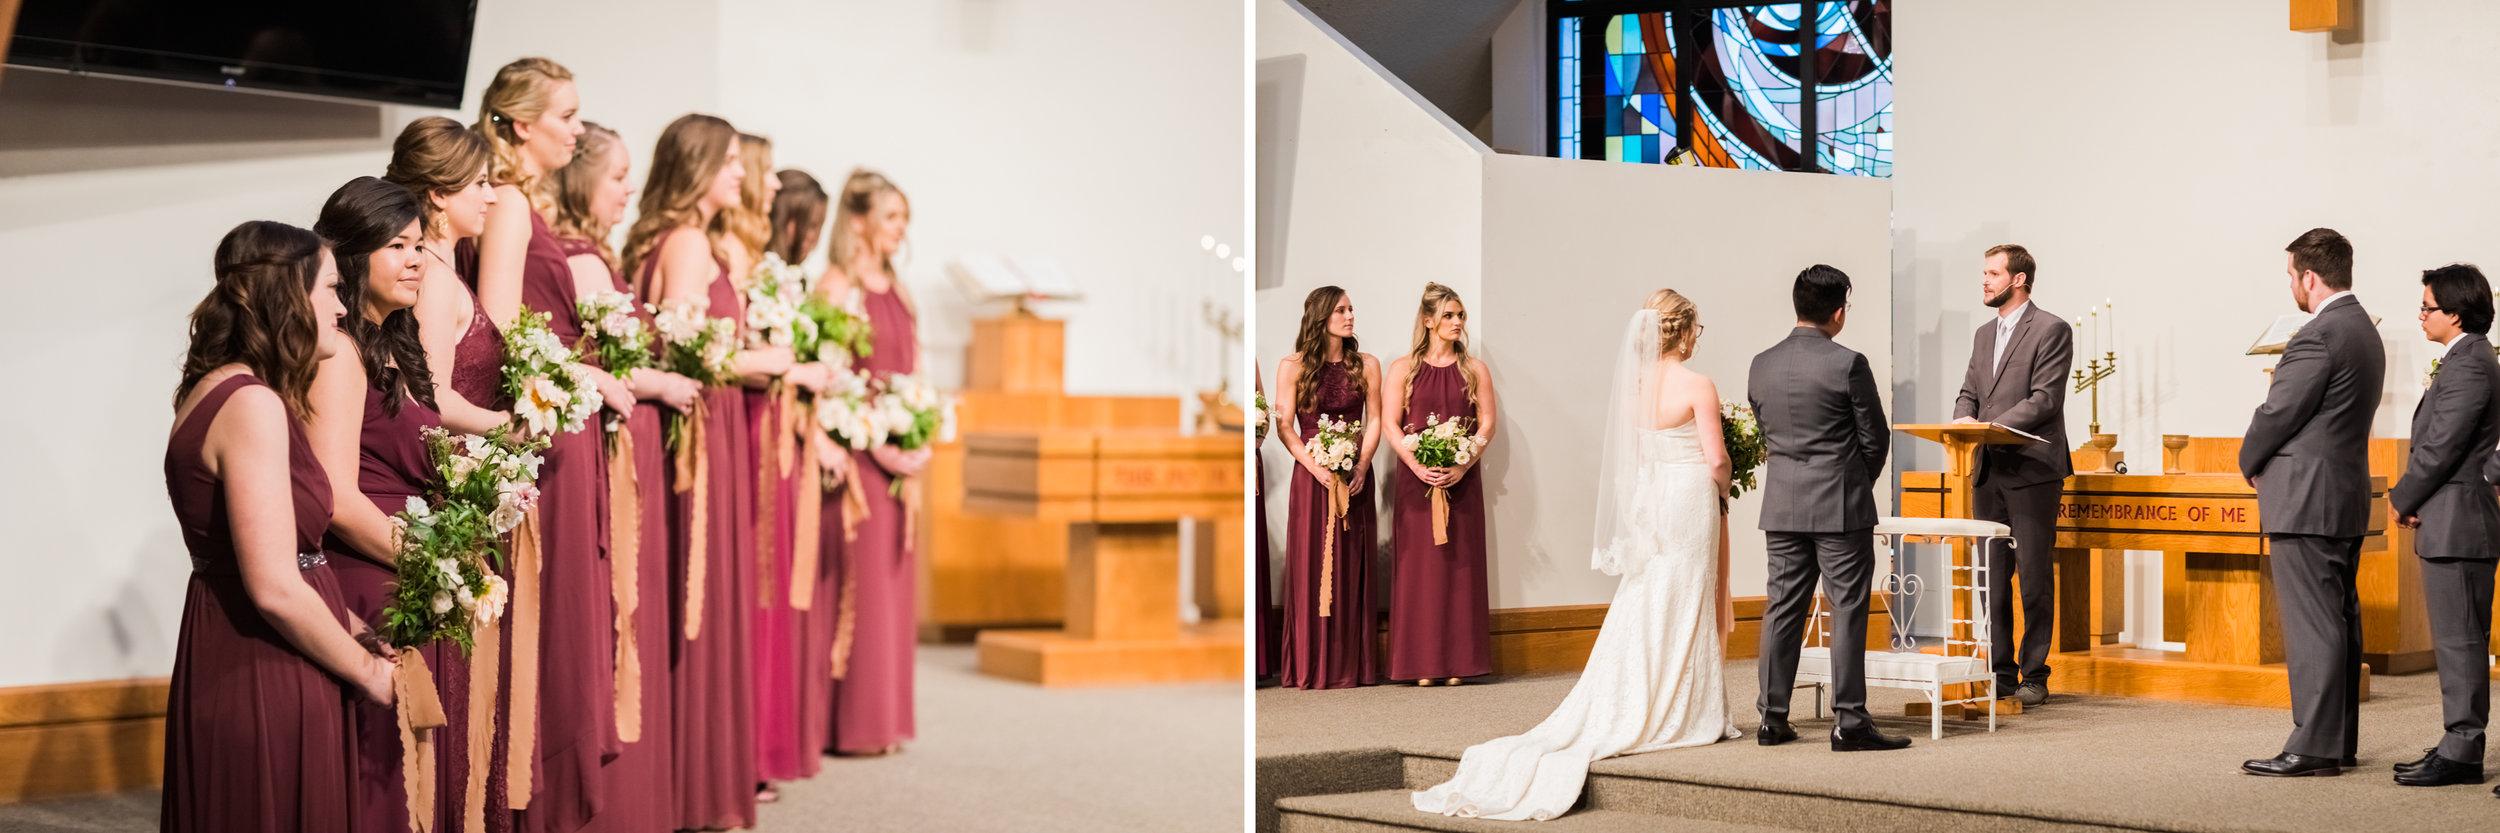 Kansas City Wedding Photographer 51.jpg